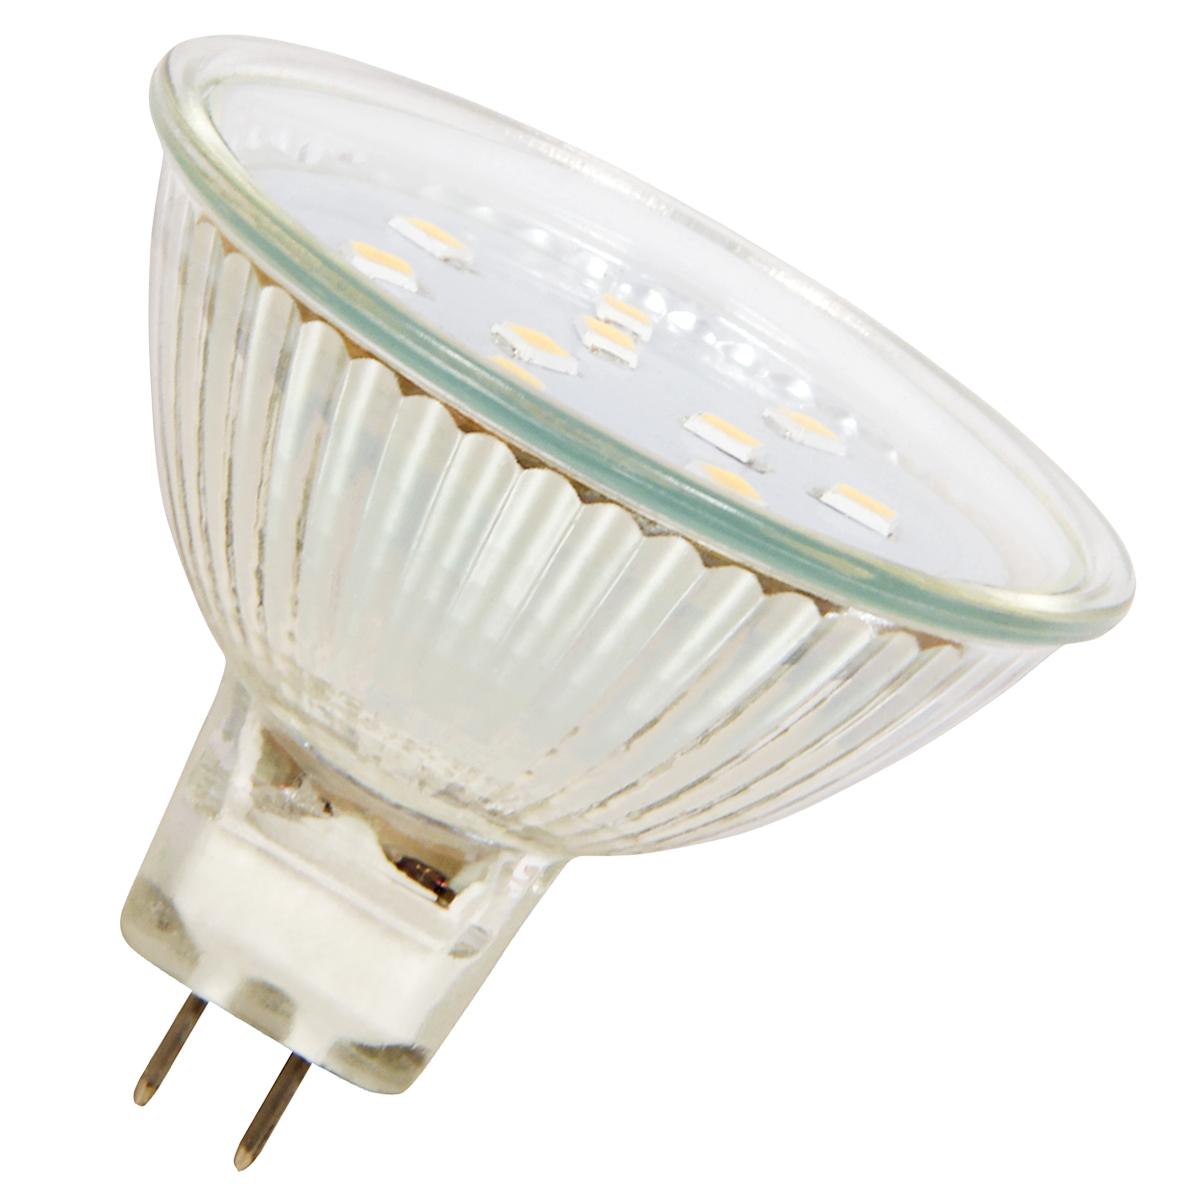 LED-Strahler MR16 / GU5.3 / 0,8W / 60lm / Kaltweiß